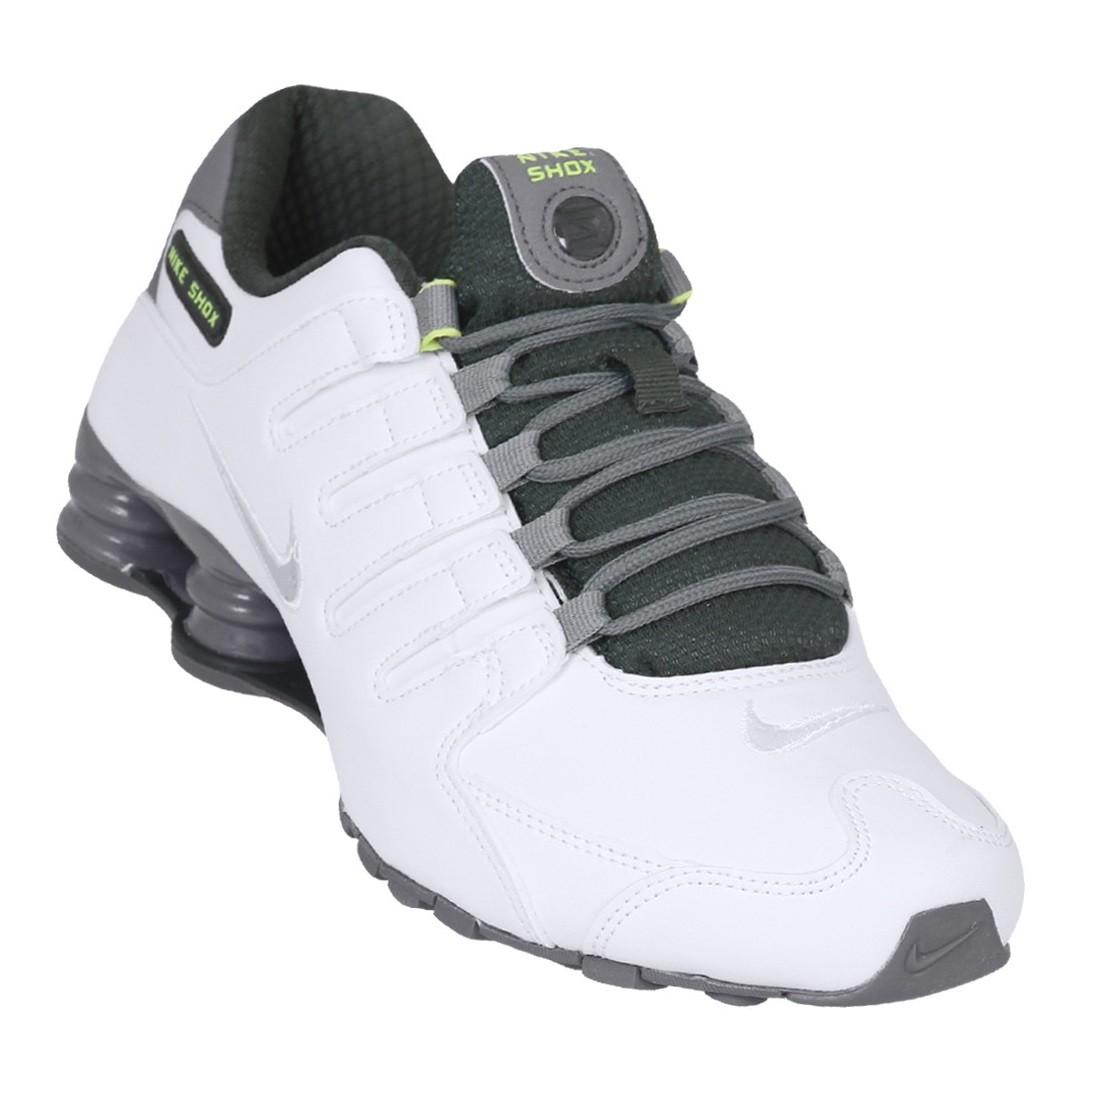 fc736ee9e8e Tênis Nike Shox NZ SE Masculino 833579-101 - Branco Verde Cinza ...